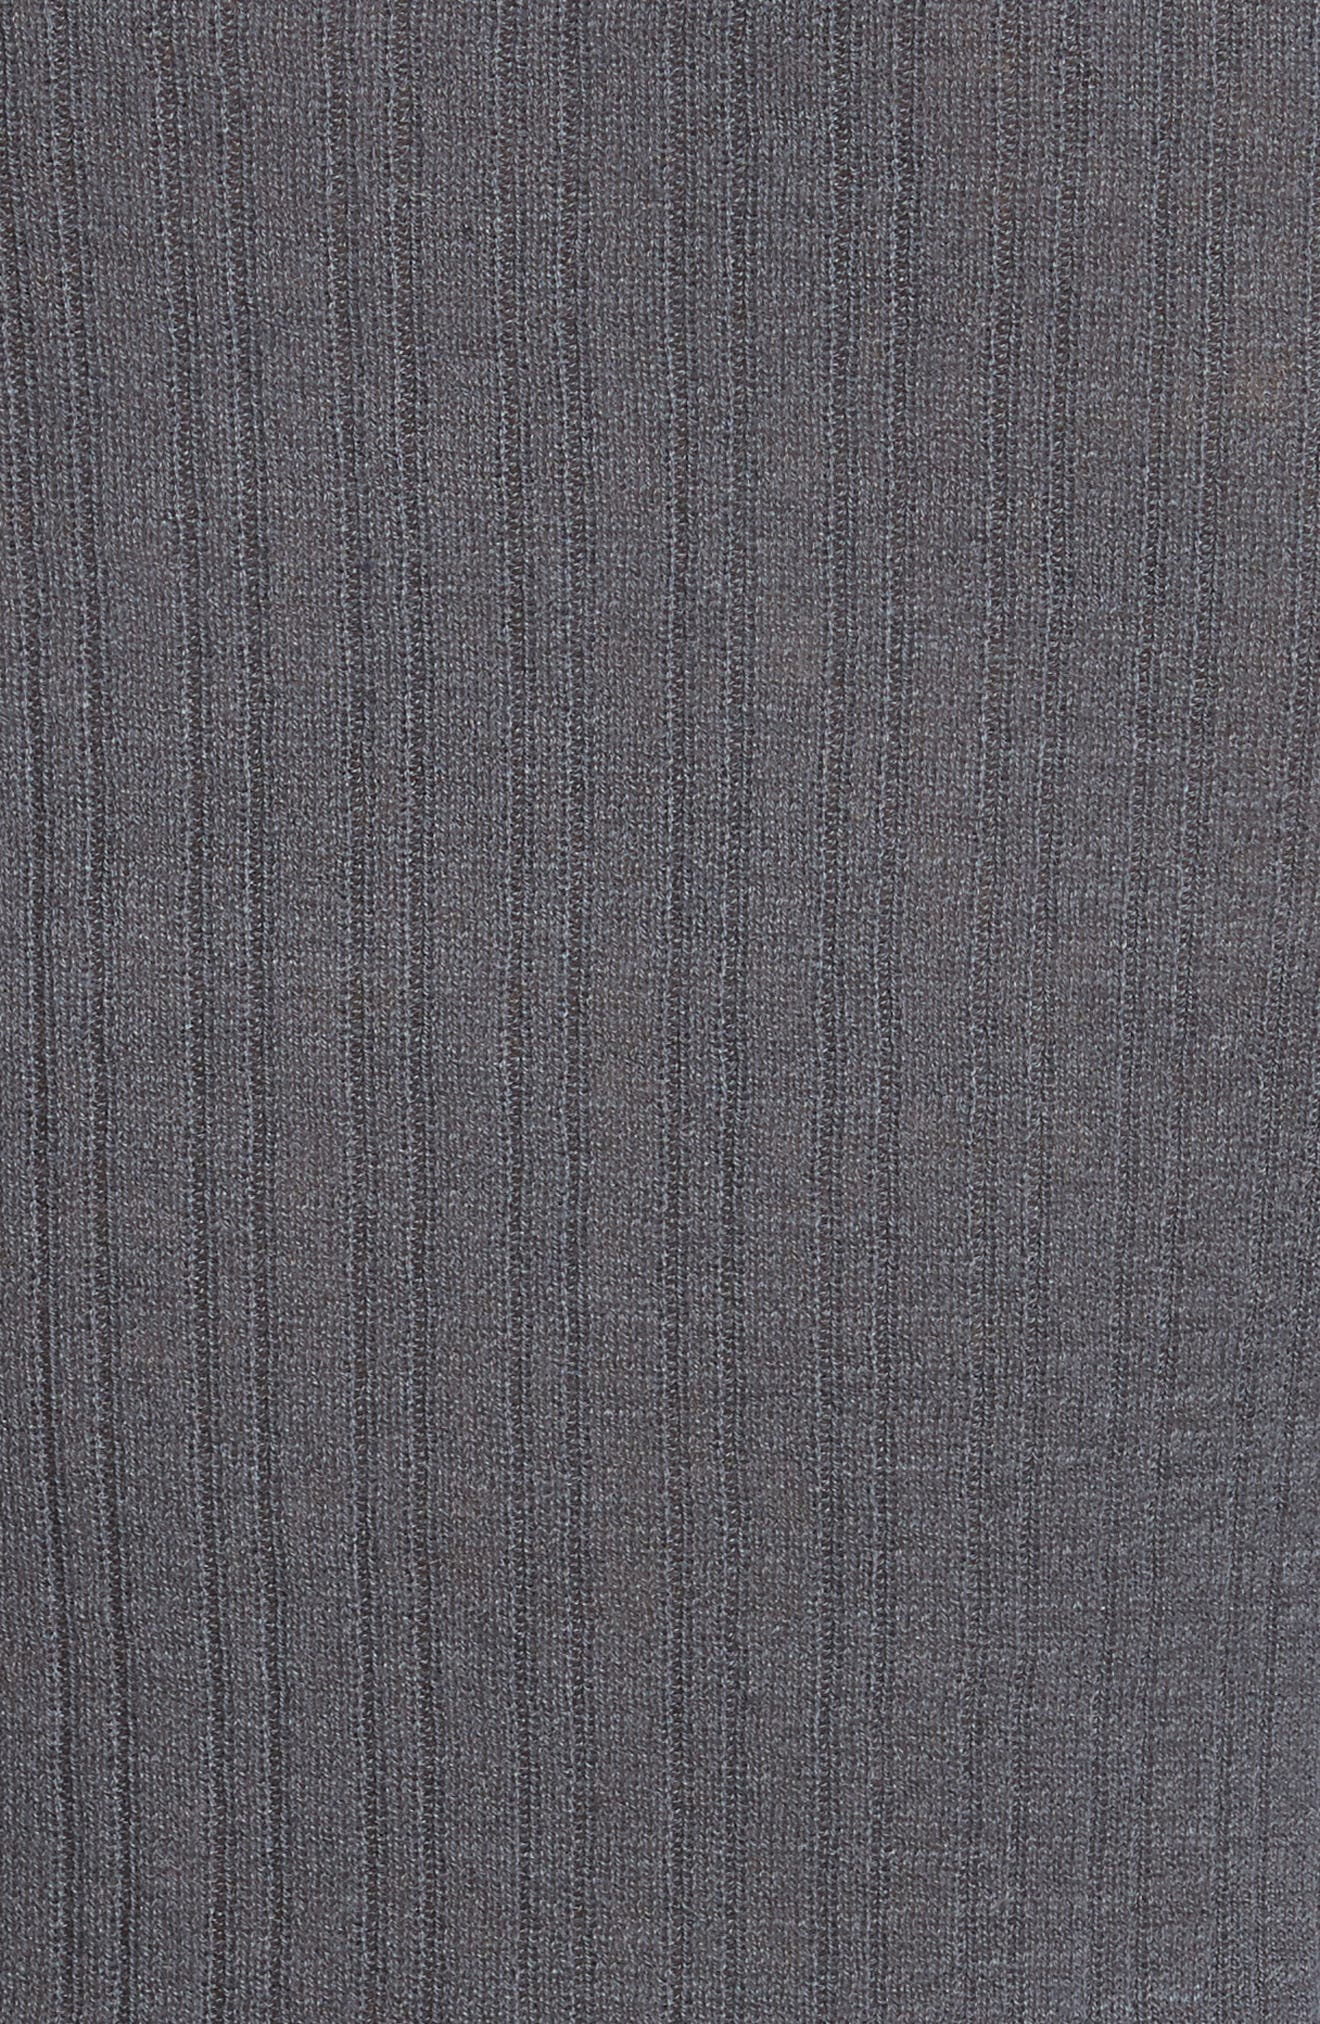 Ribbed Cashmere V-Neck Sweater,                             Alternate thumbnail 14, color,